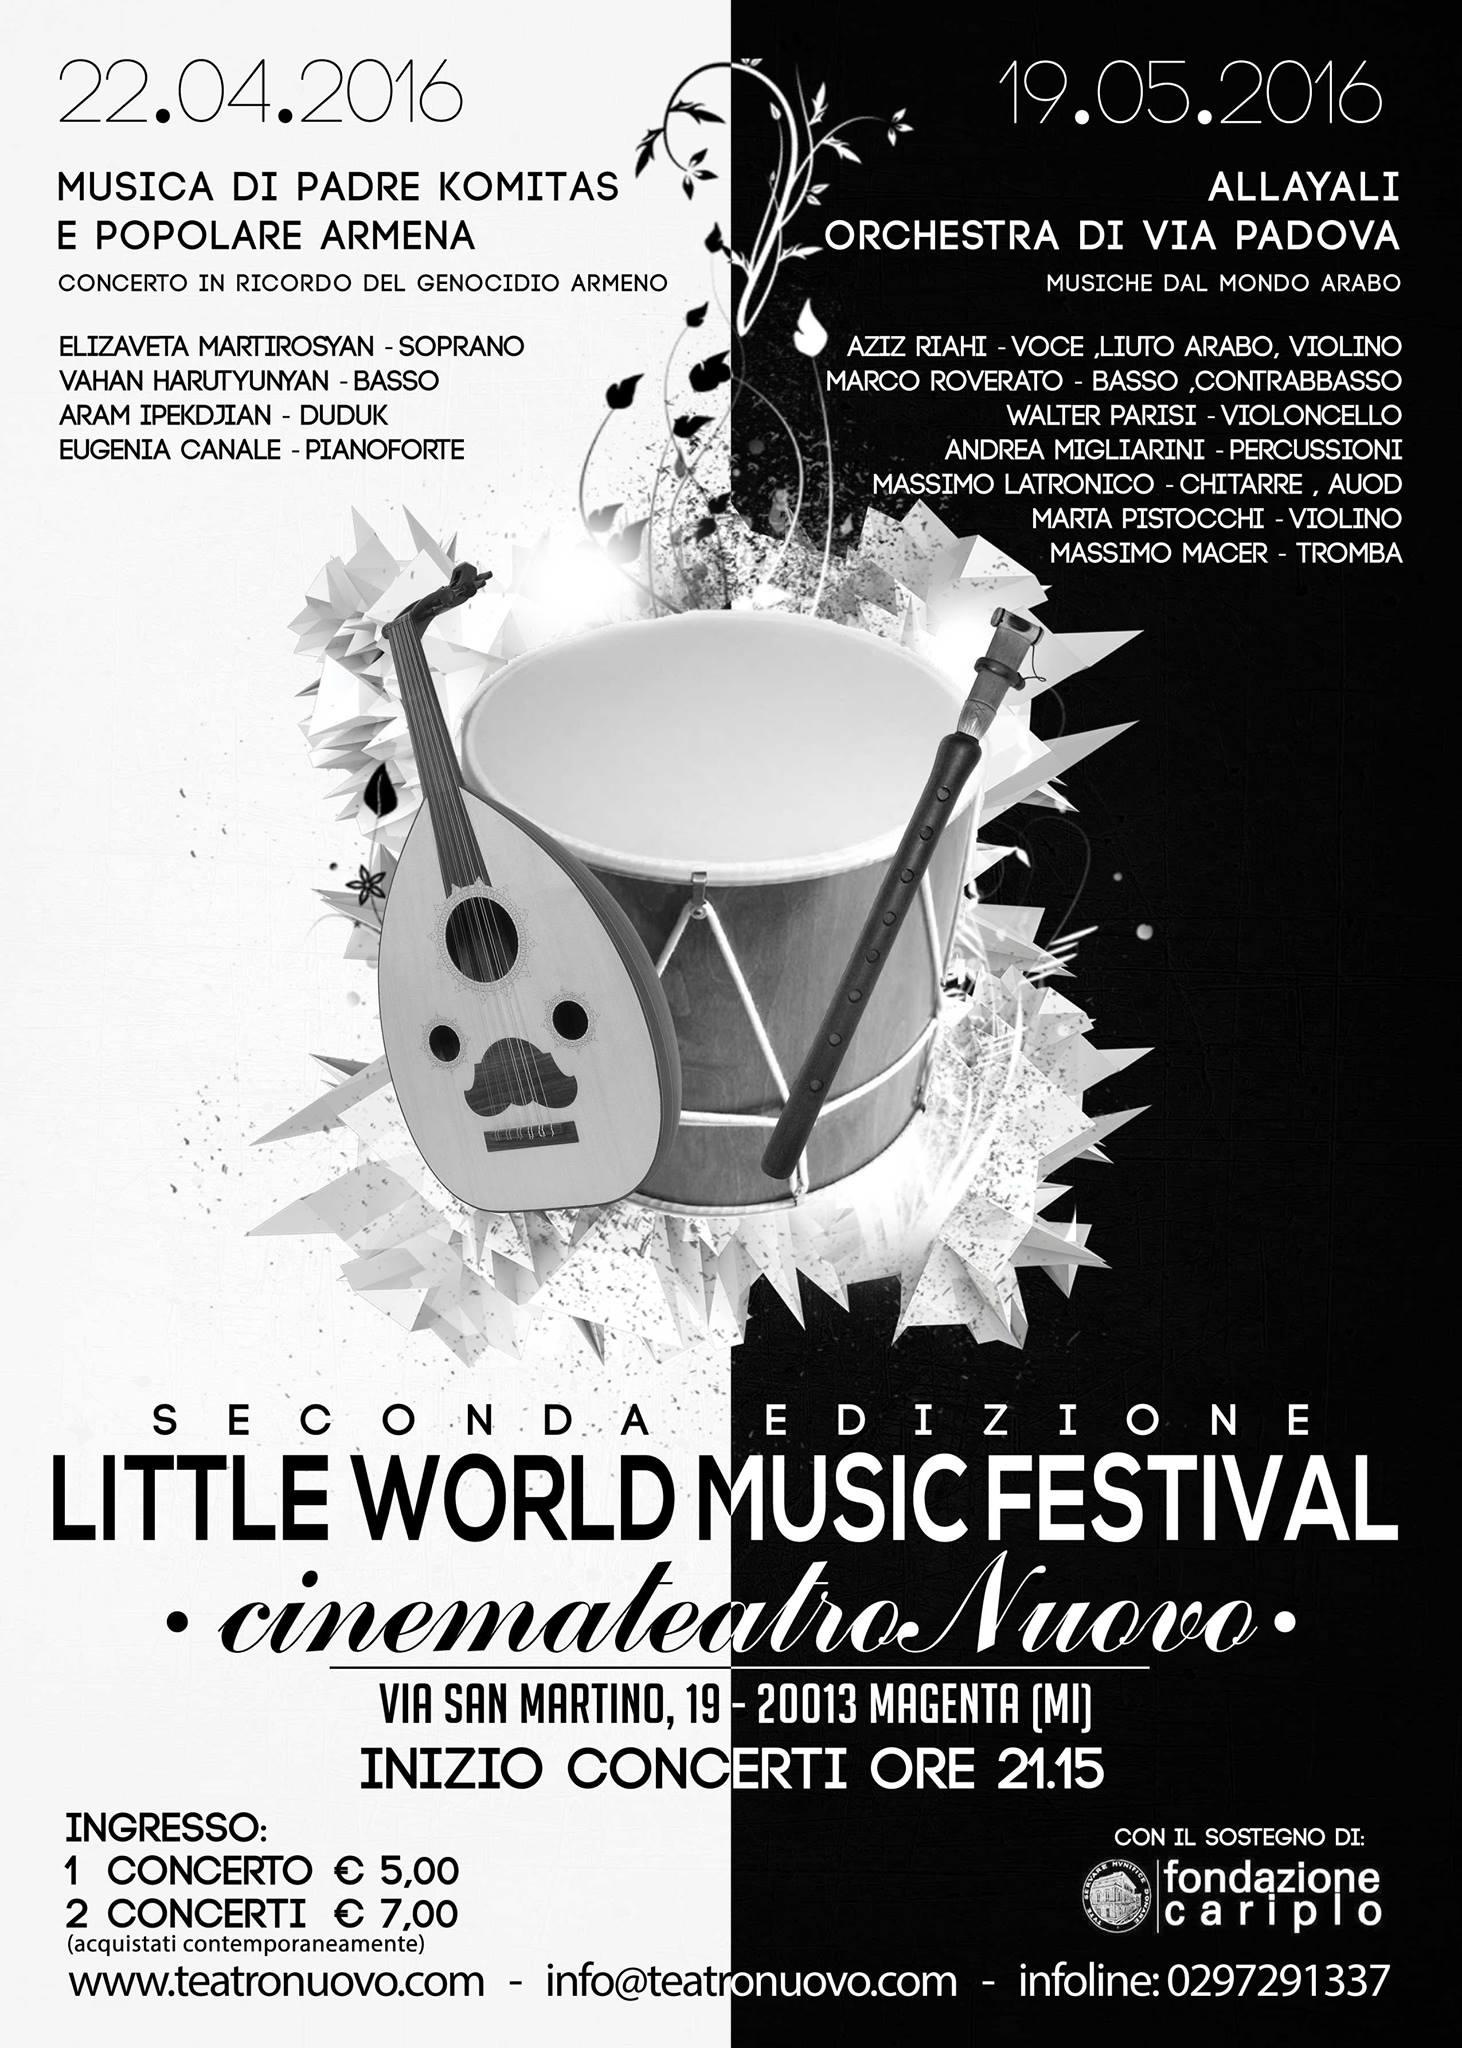 Little-world-music-festival_2016_CTN